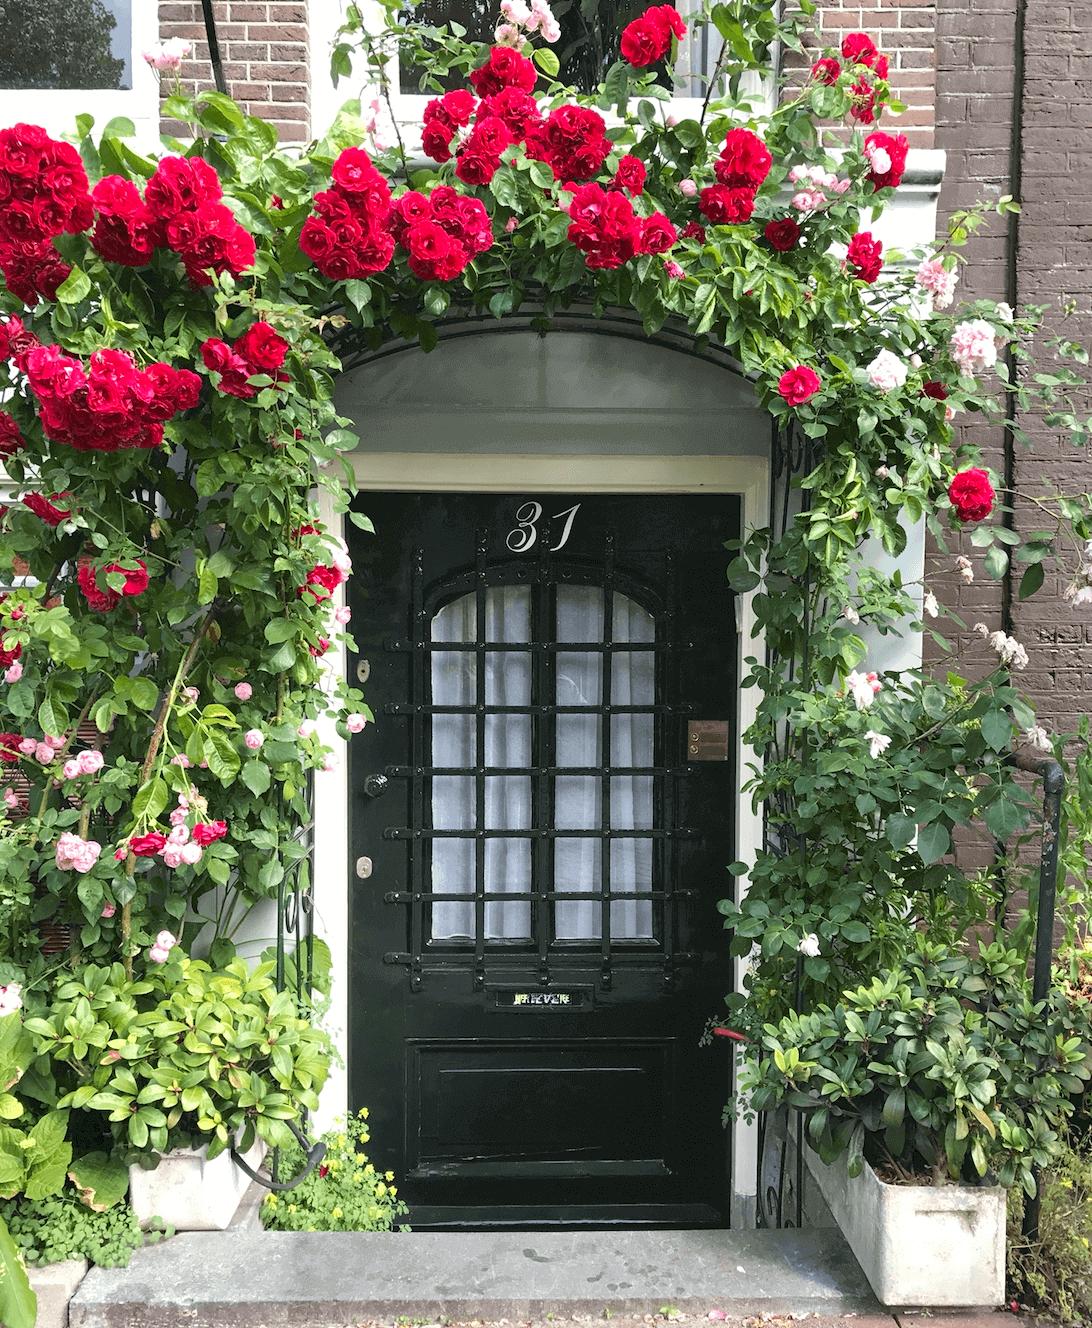 Dulce Amsterdam